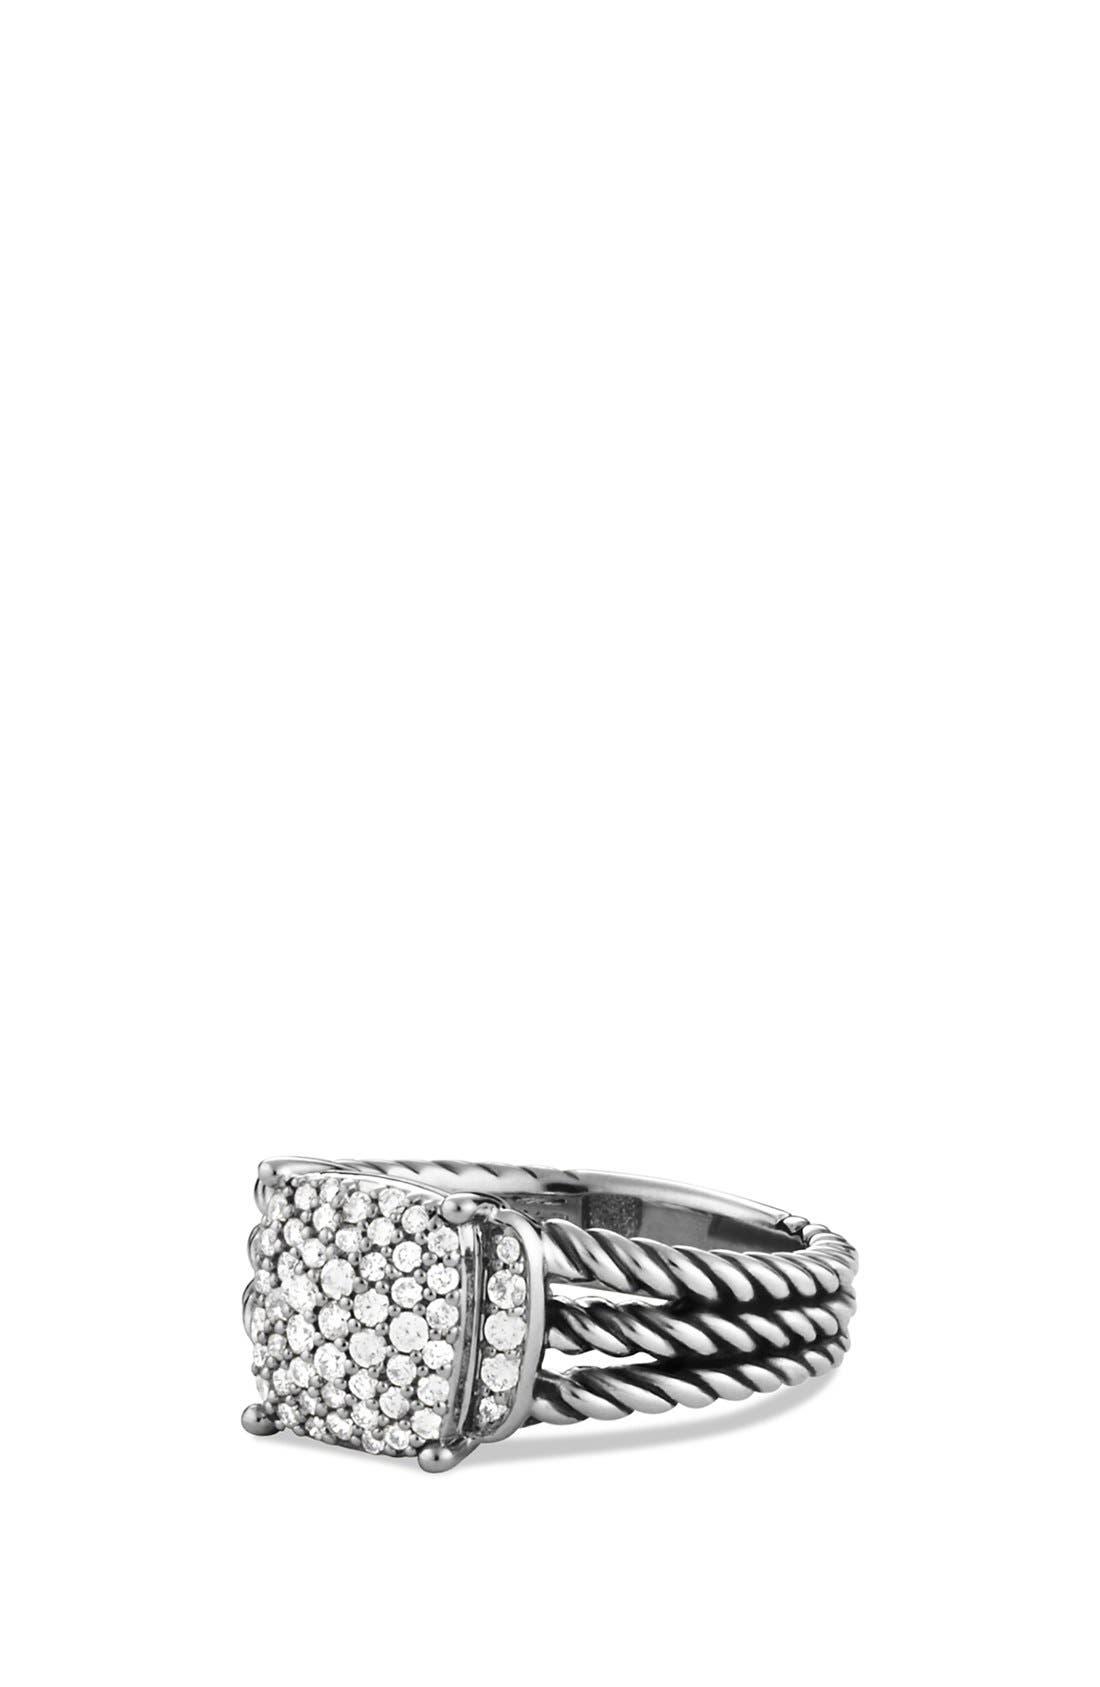 David Yurman 'Wheaton' Petite Ring with Diamonds